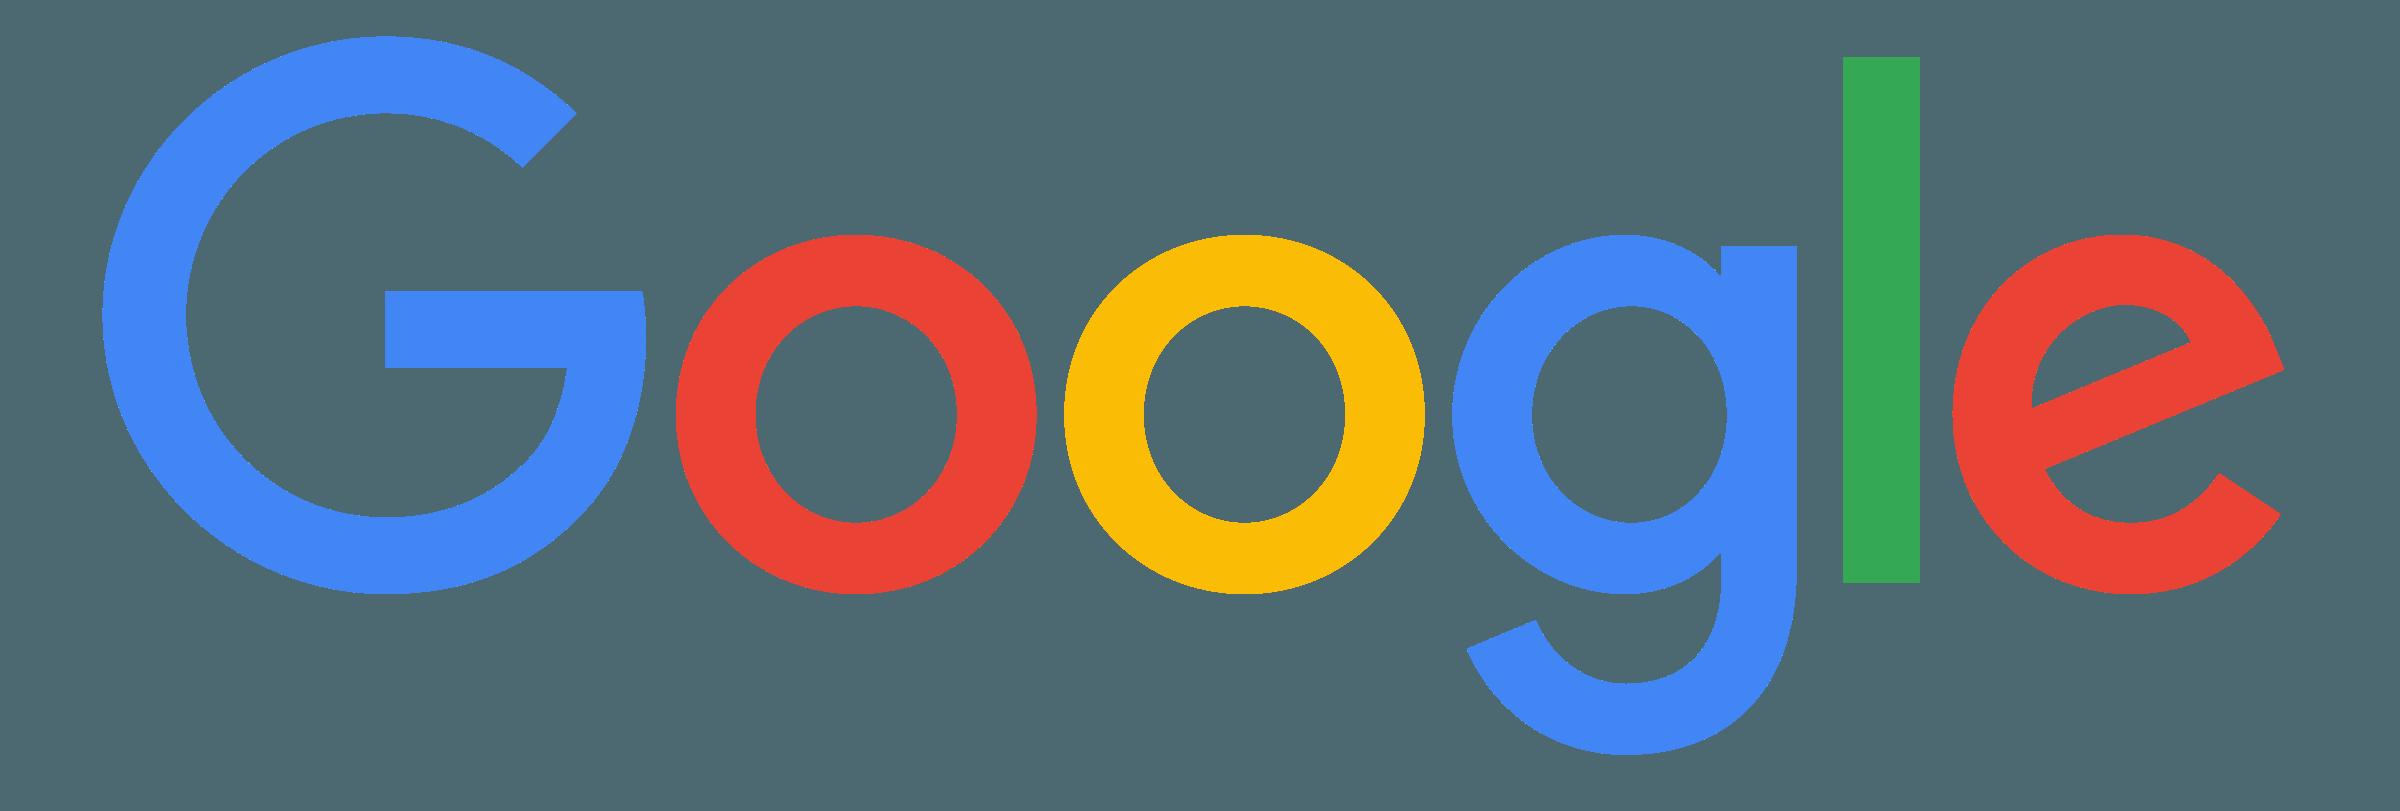 kisspng google i o google logo google 5abe0c79e0a069.7456660315224044739201 - Schreinerei Wilhelm